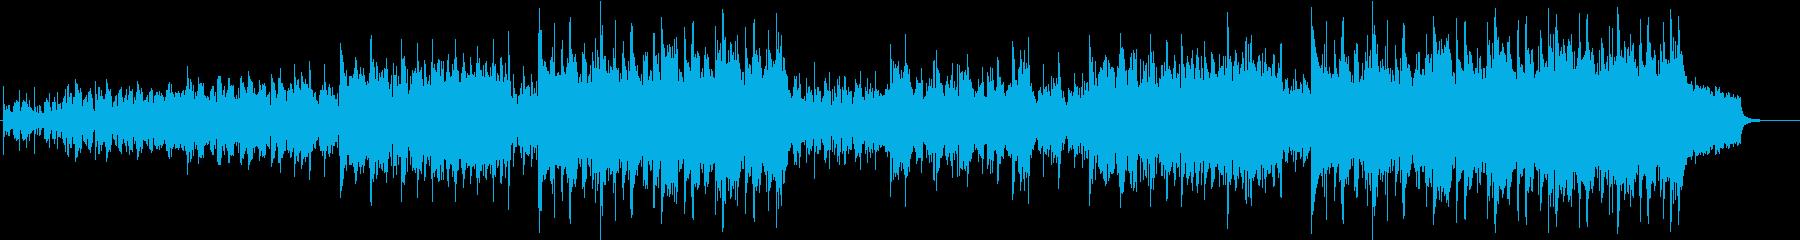 Rhythmic and lively Celtic folk music's reproduced waveform